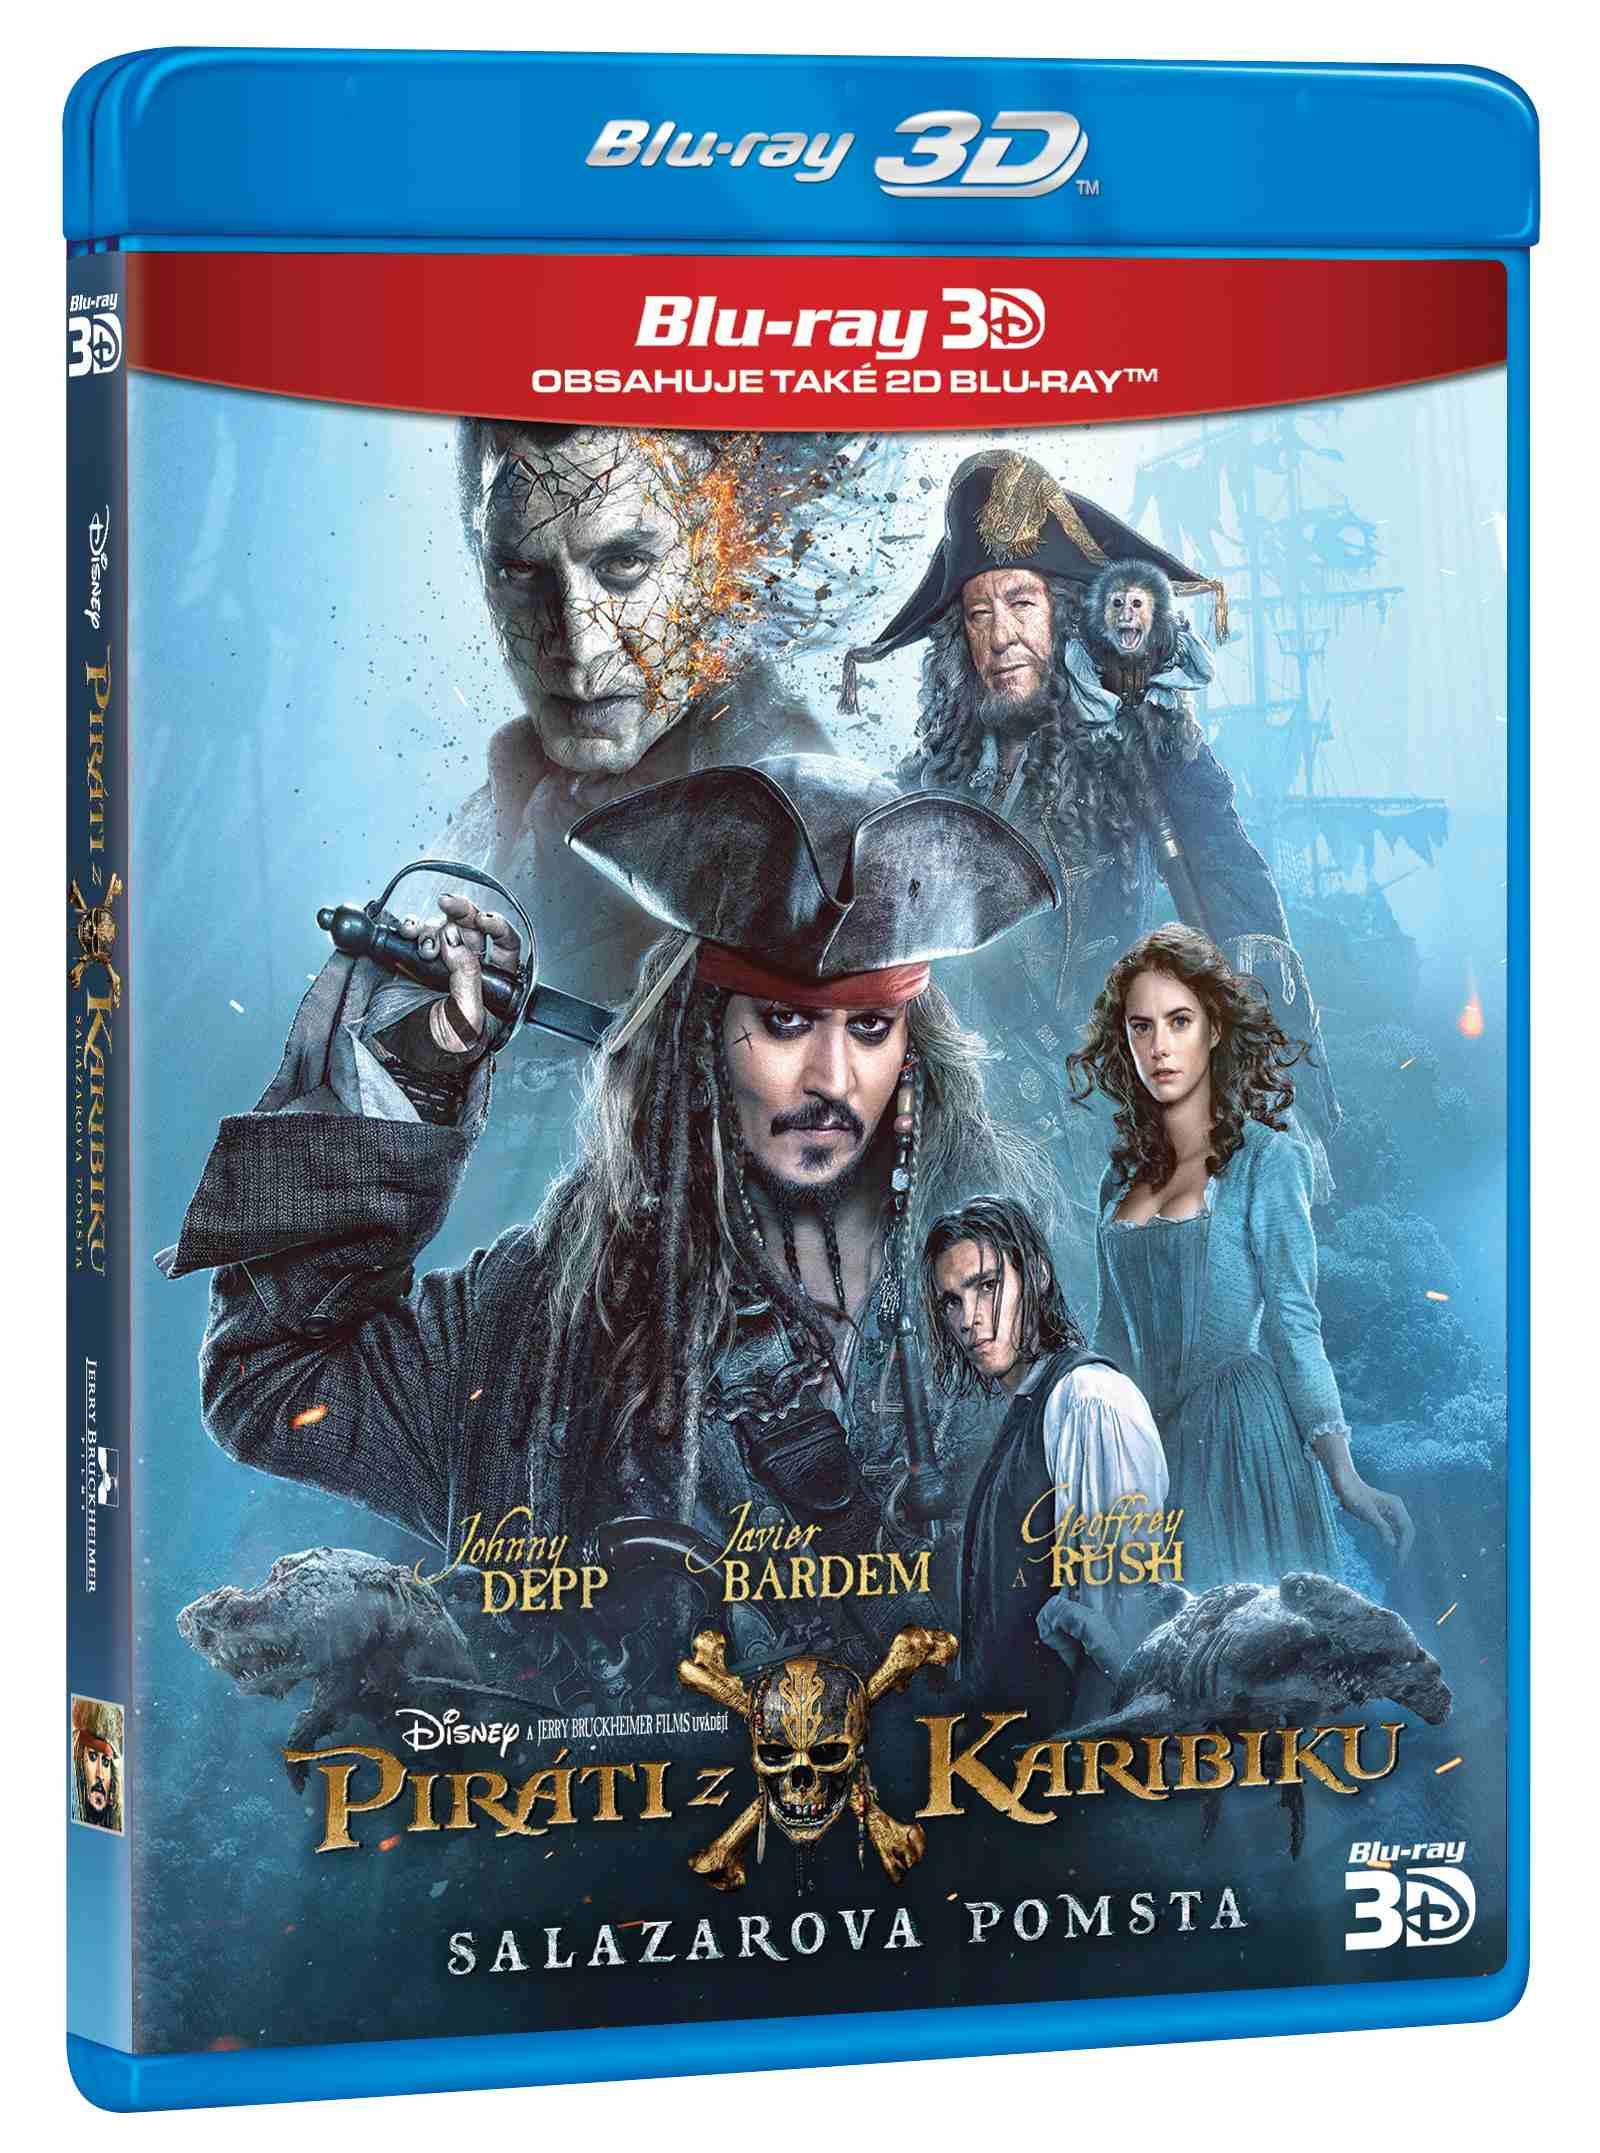 PIRÁTI Z KARIBIKU: SALAZAROVA POMSTA - Blu-ray 3D + 2D